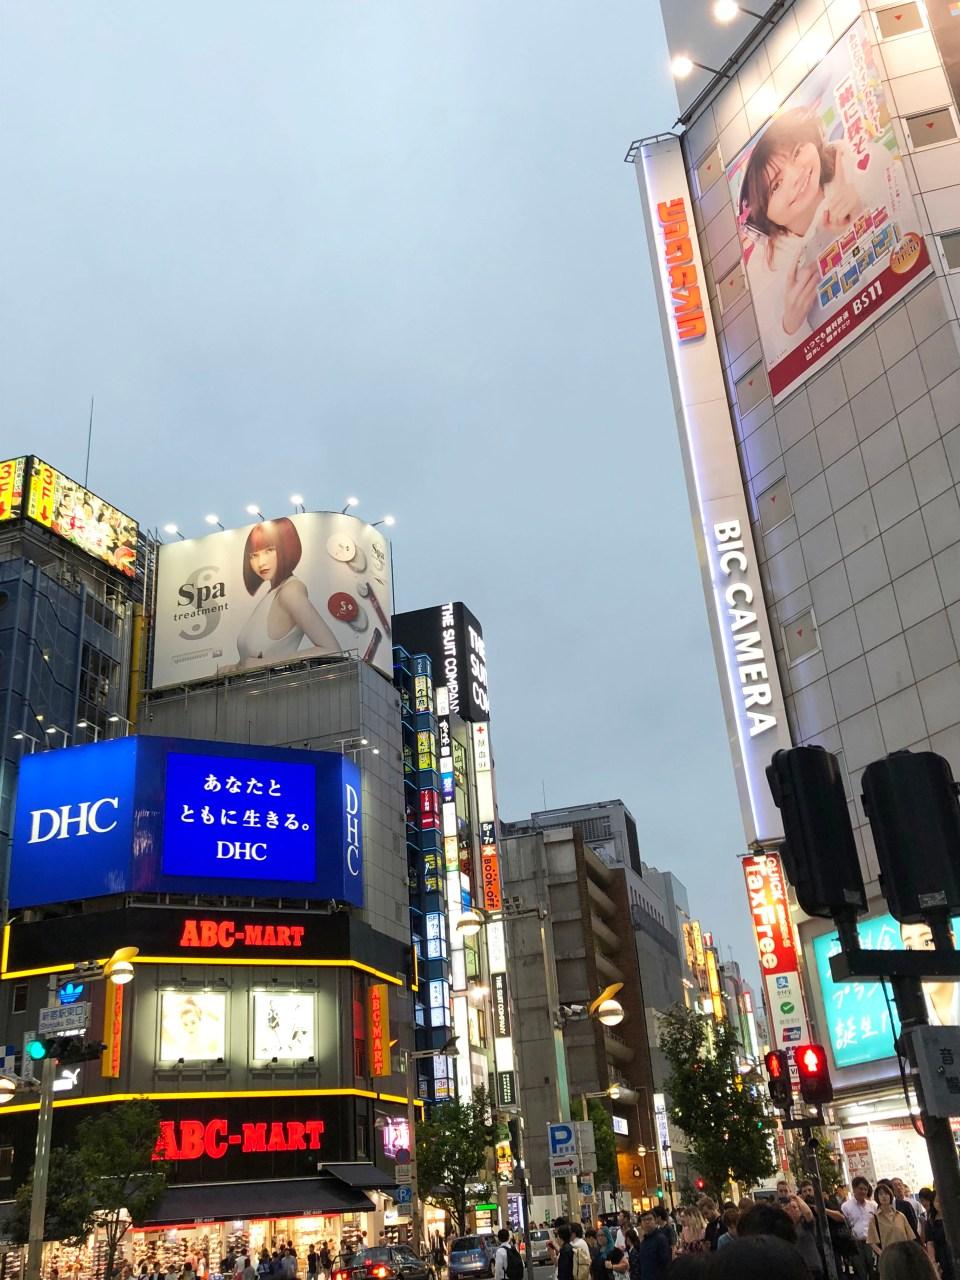 Shinjuku - night time 7